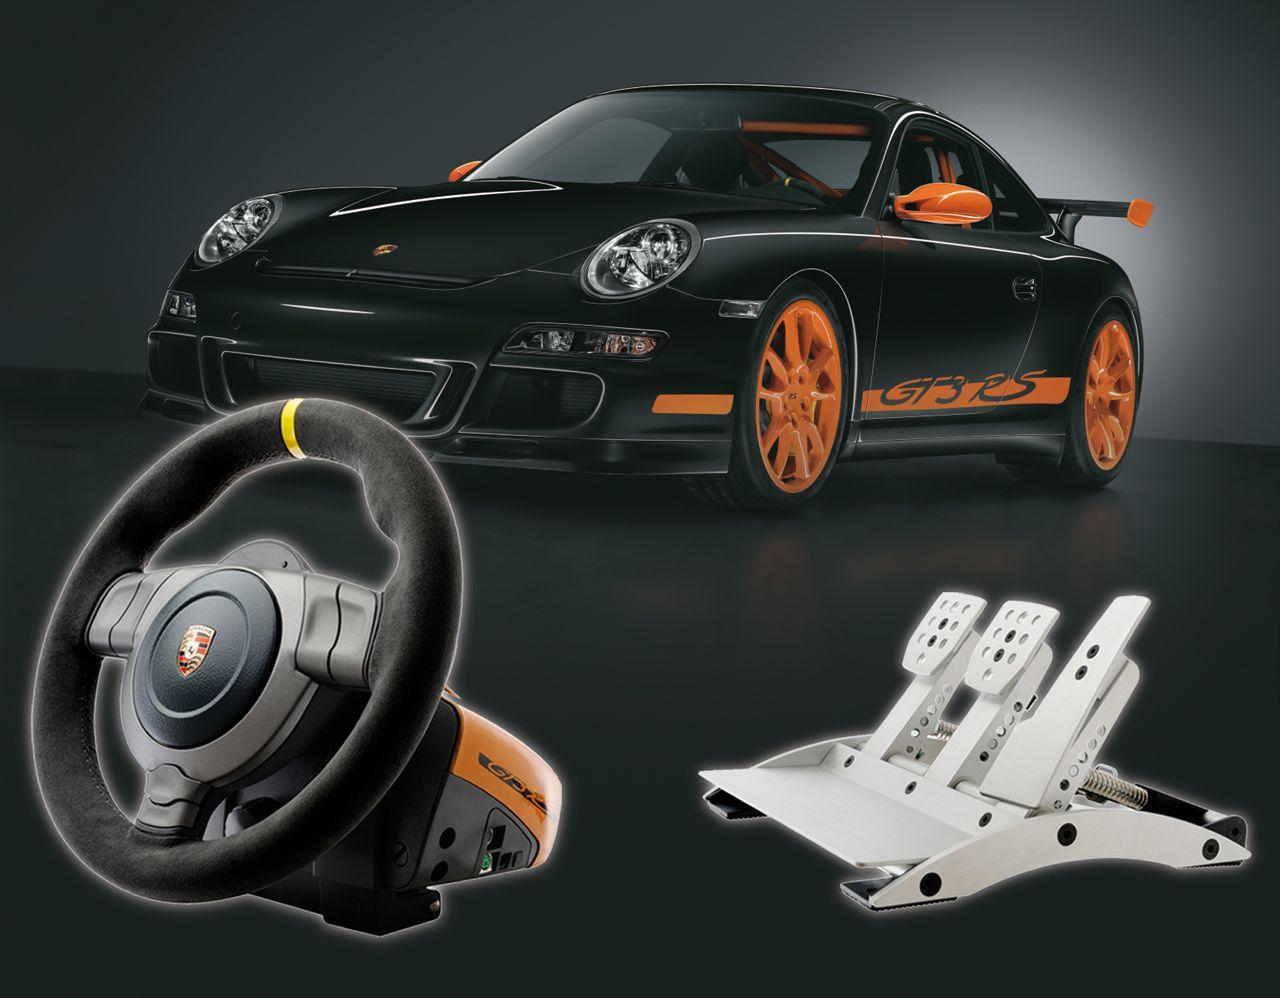 Porsche 911 GT3 RS Racing Wheel by Fanatec